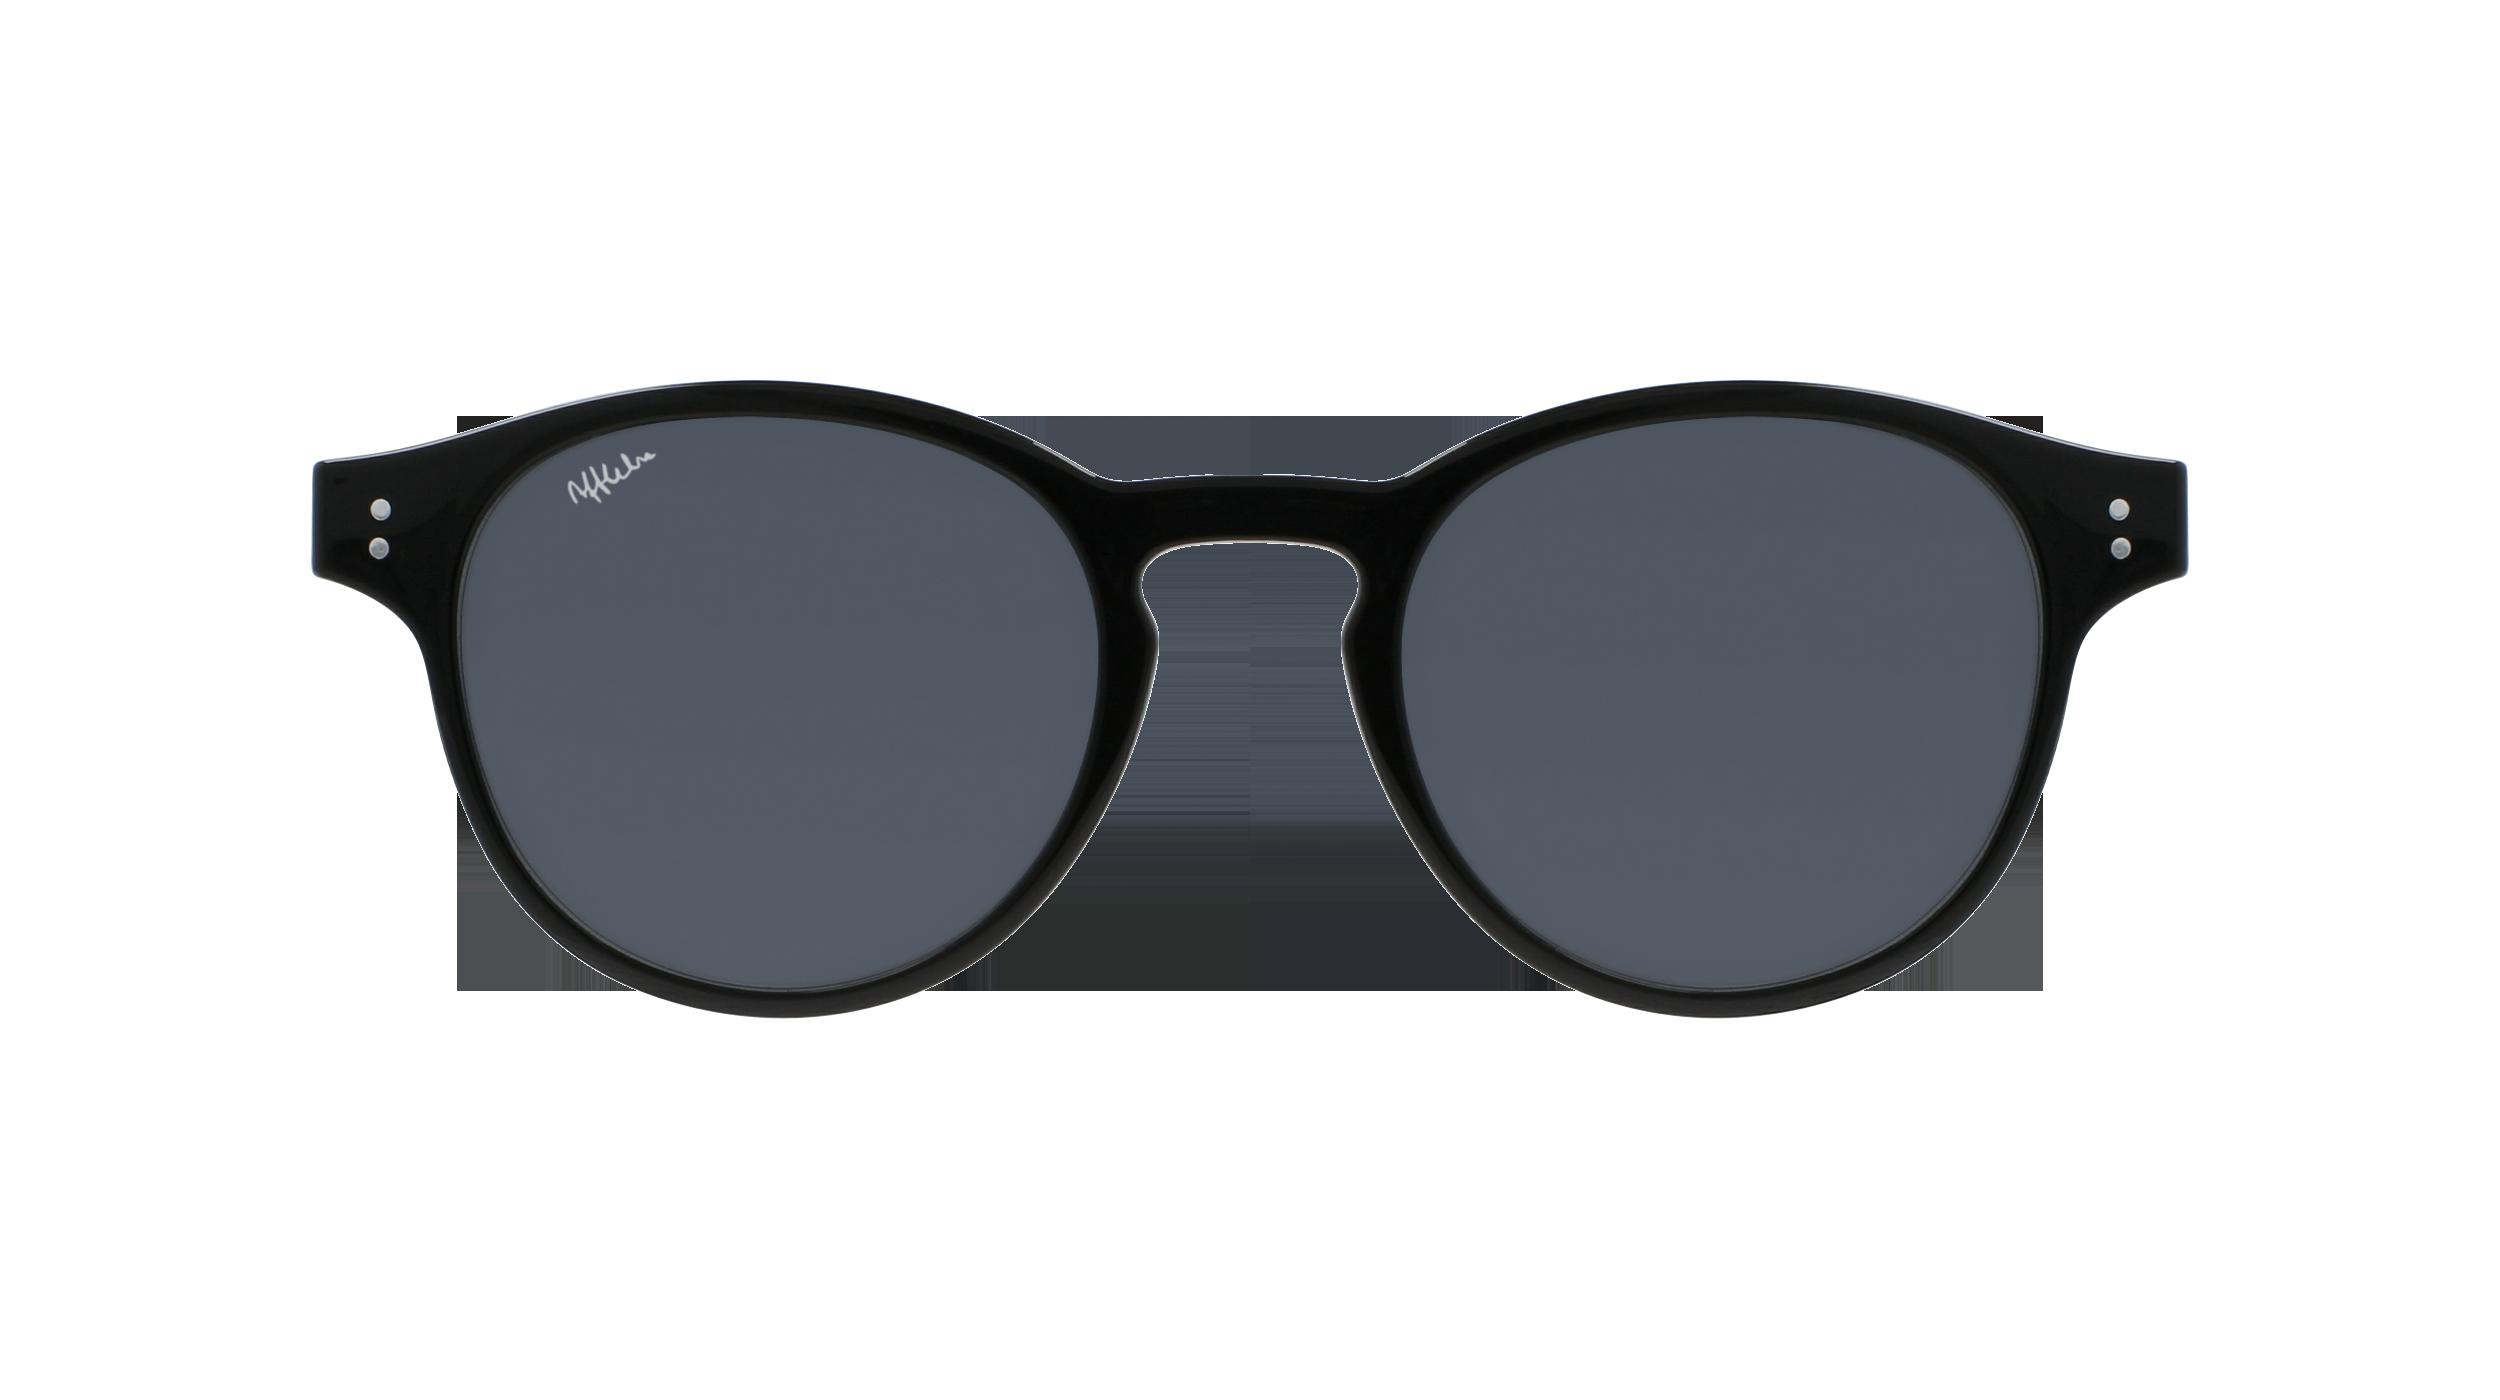 afflelou/france/products/smart_clip/clips_glasses/07630036436059.png